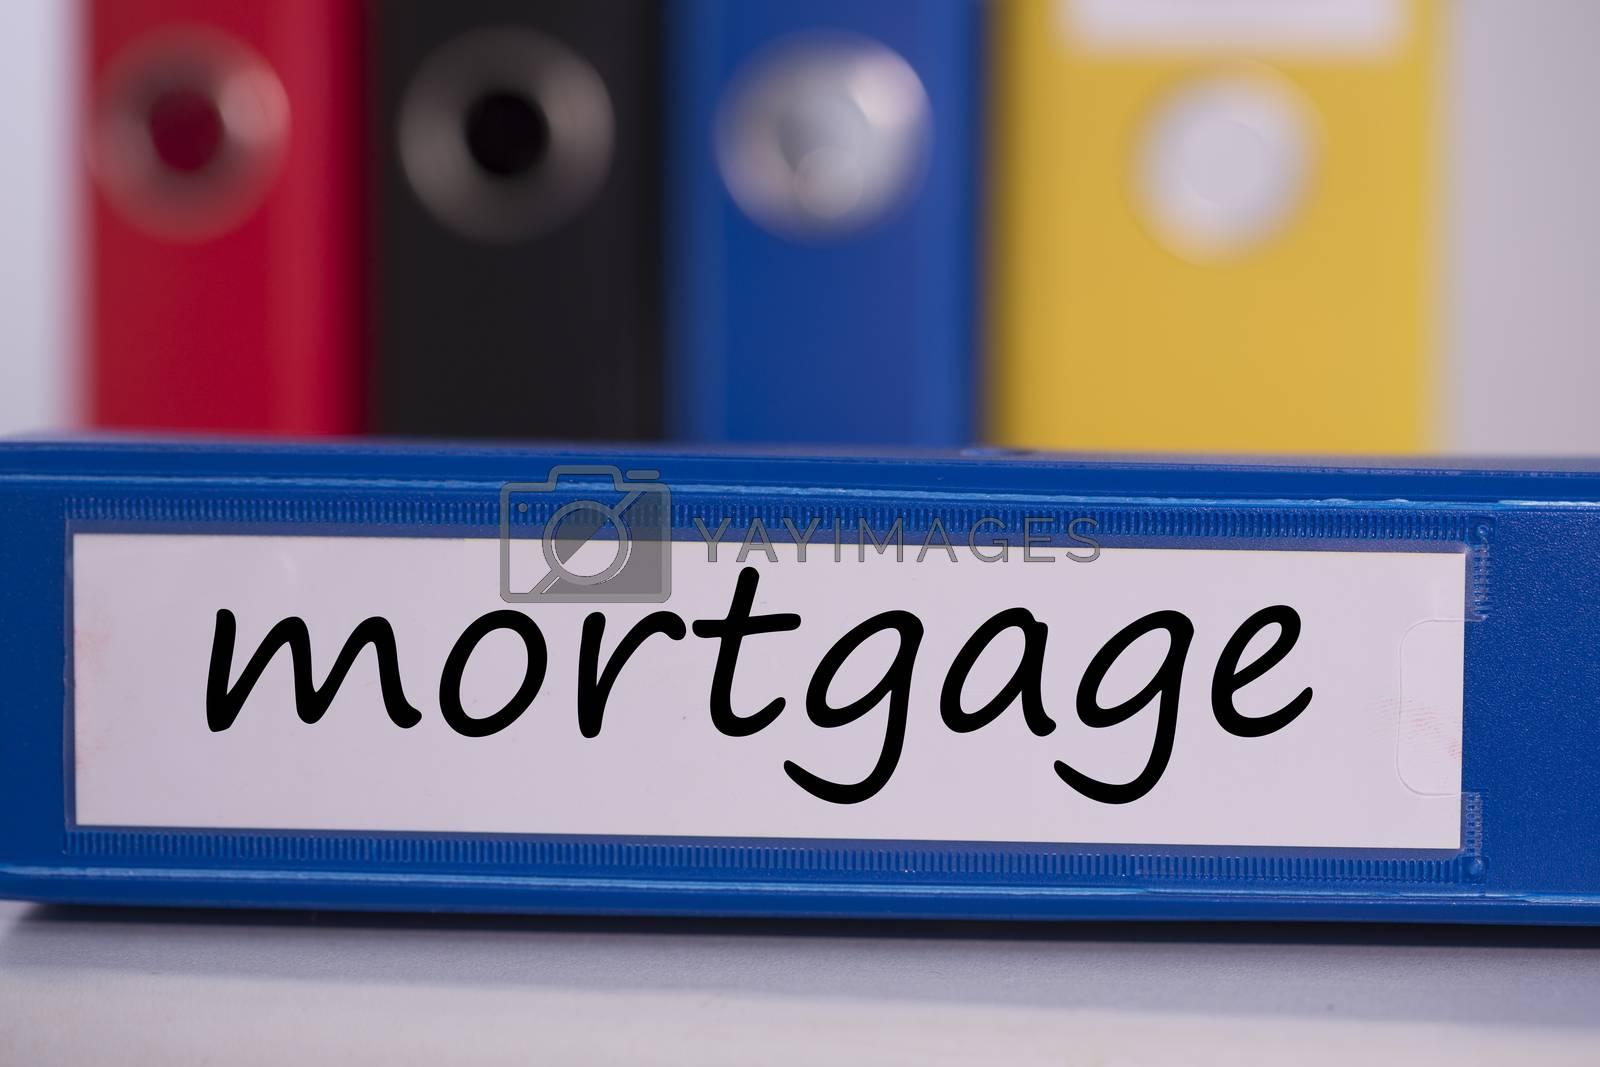 Mortgage on blue business binder by Wavebreakmedia